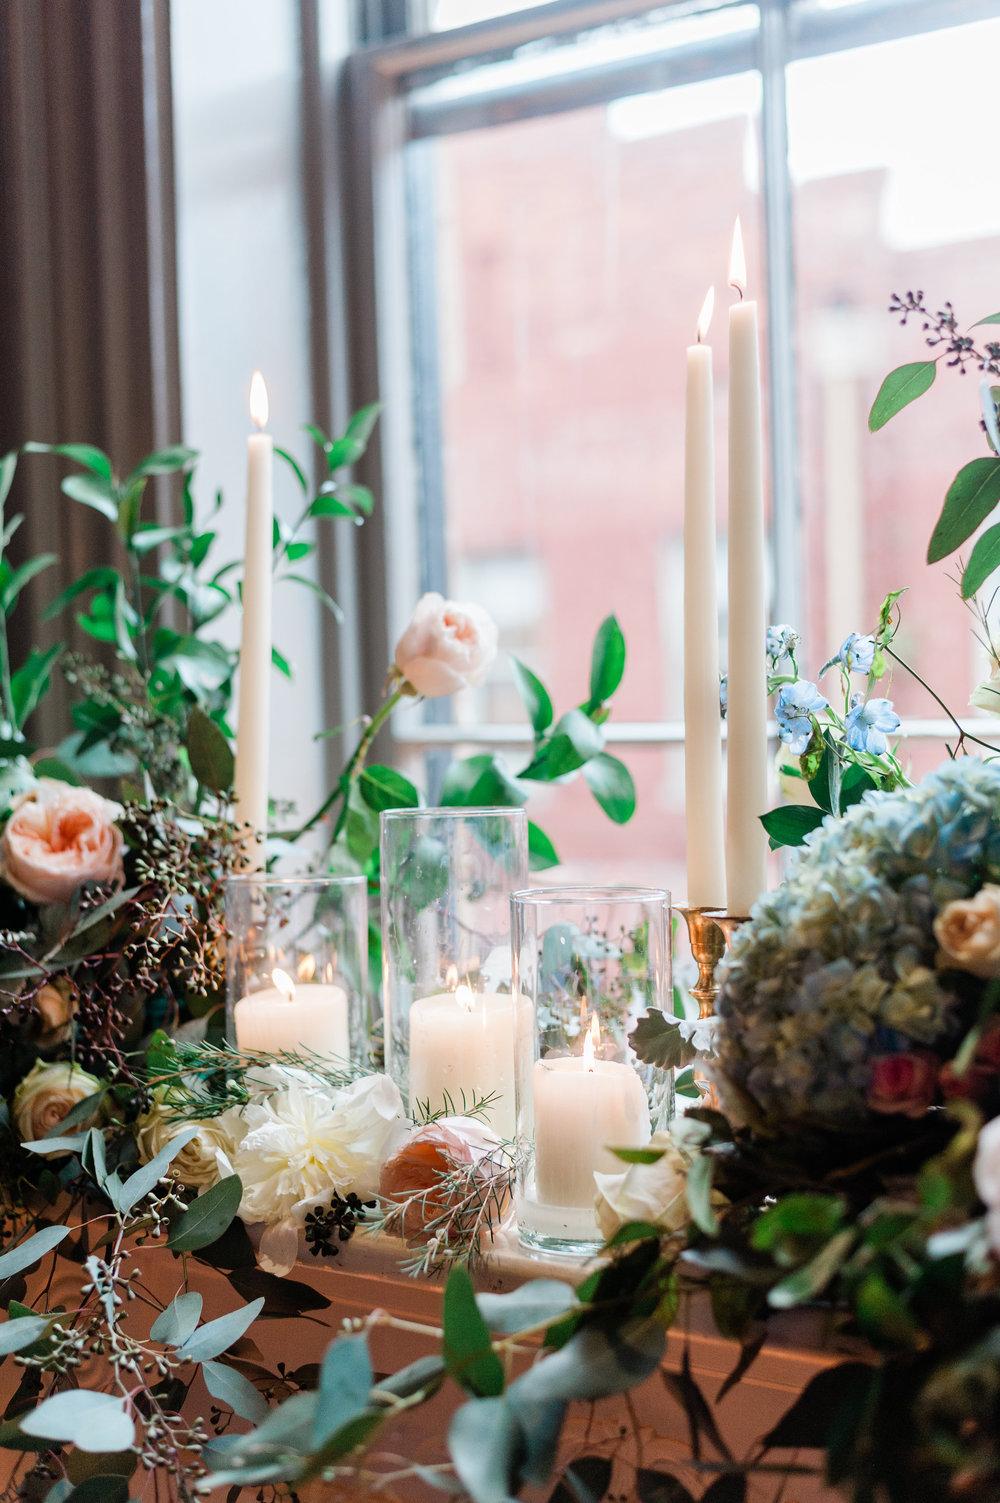 ivory-and-beau-bridal-boutique-i-and-b-florals-kim-and-luke-apt-b-photography-garibaldis-cafe-savannah-savannah-vintage-rentals-14.JPG